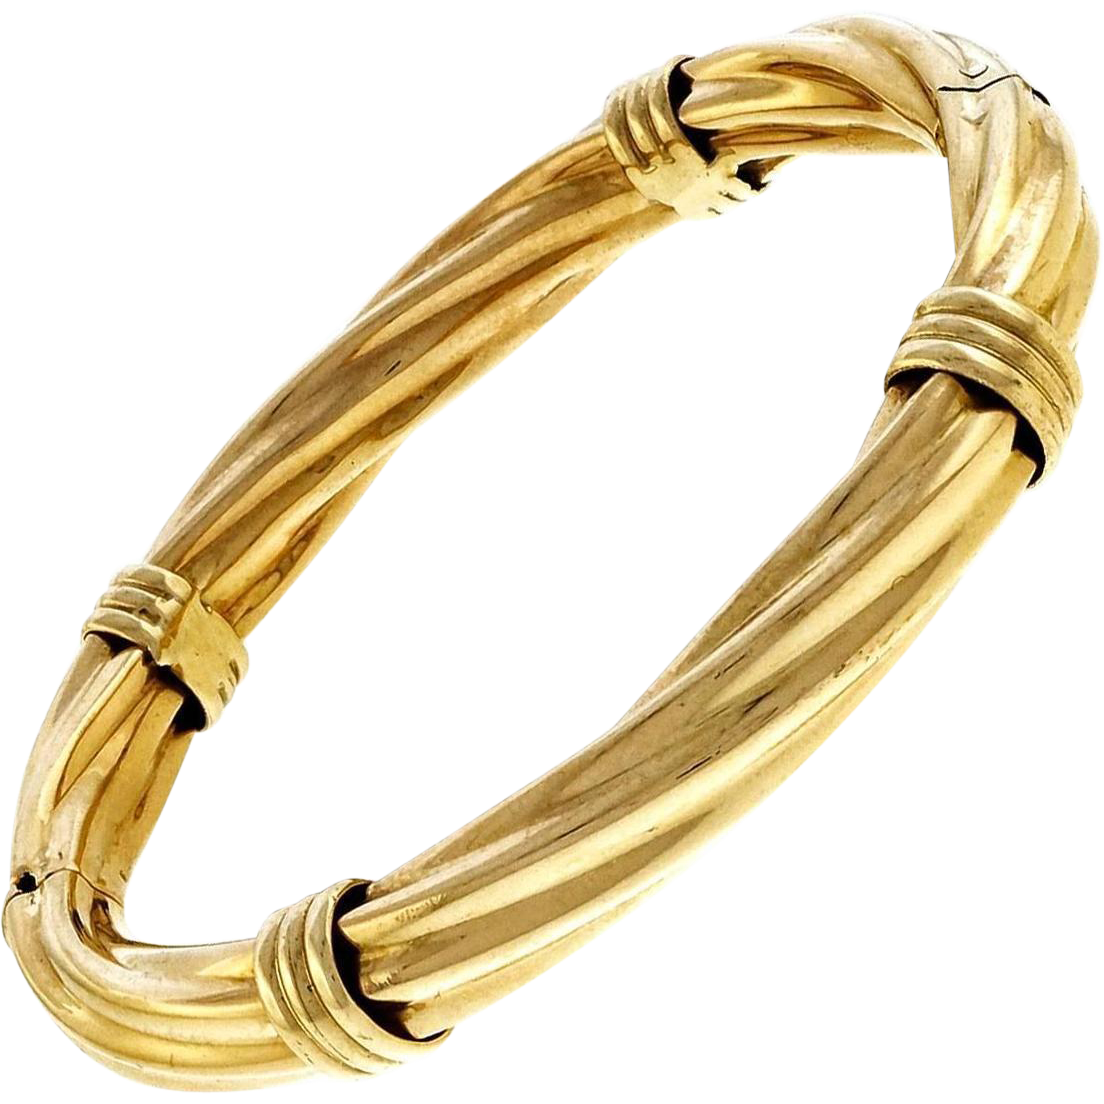 Vintage 18 Karat Yellow Gold Wide Hinged Twist Bangle Bracelet